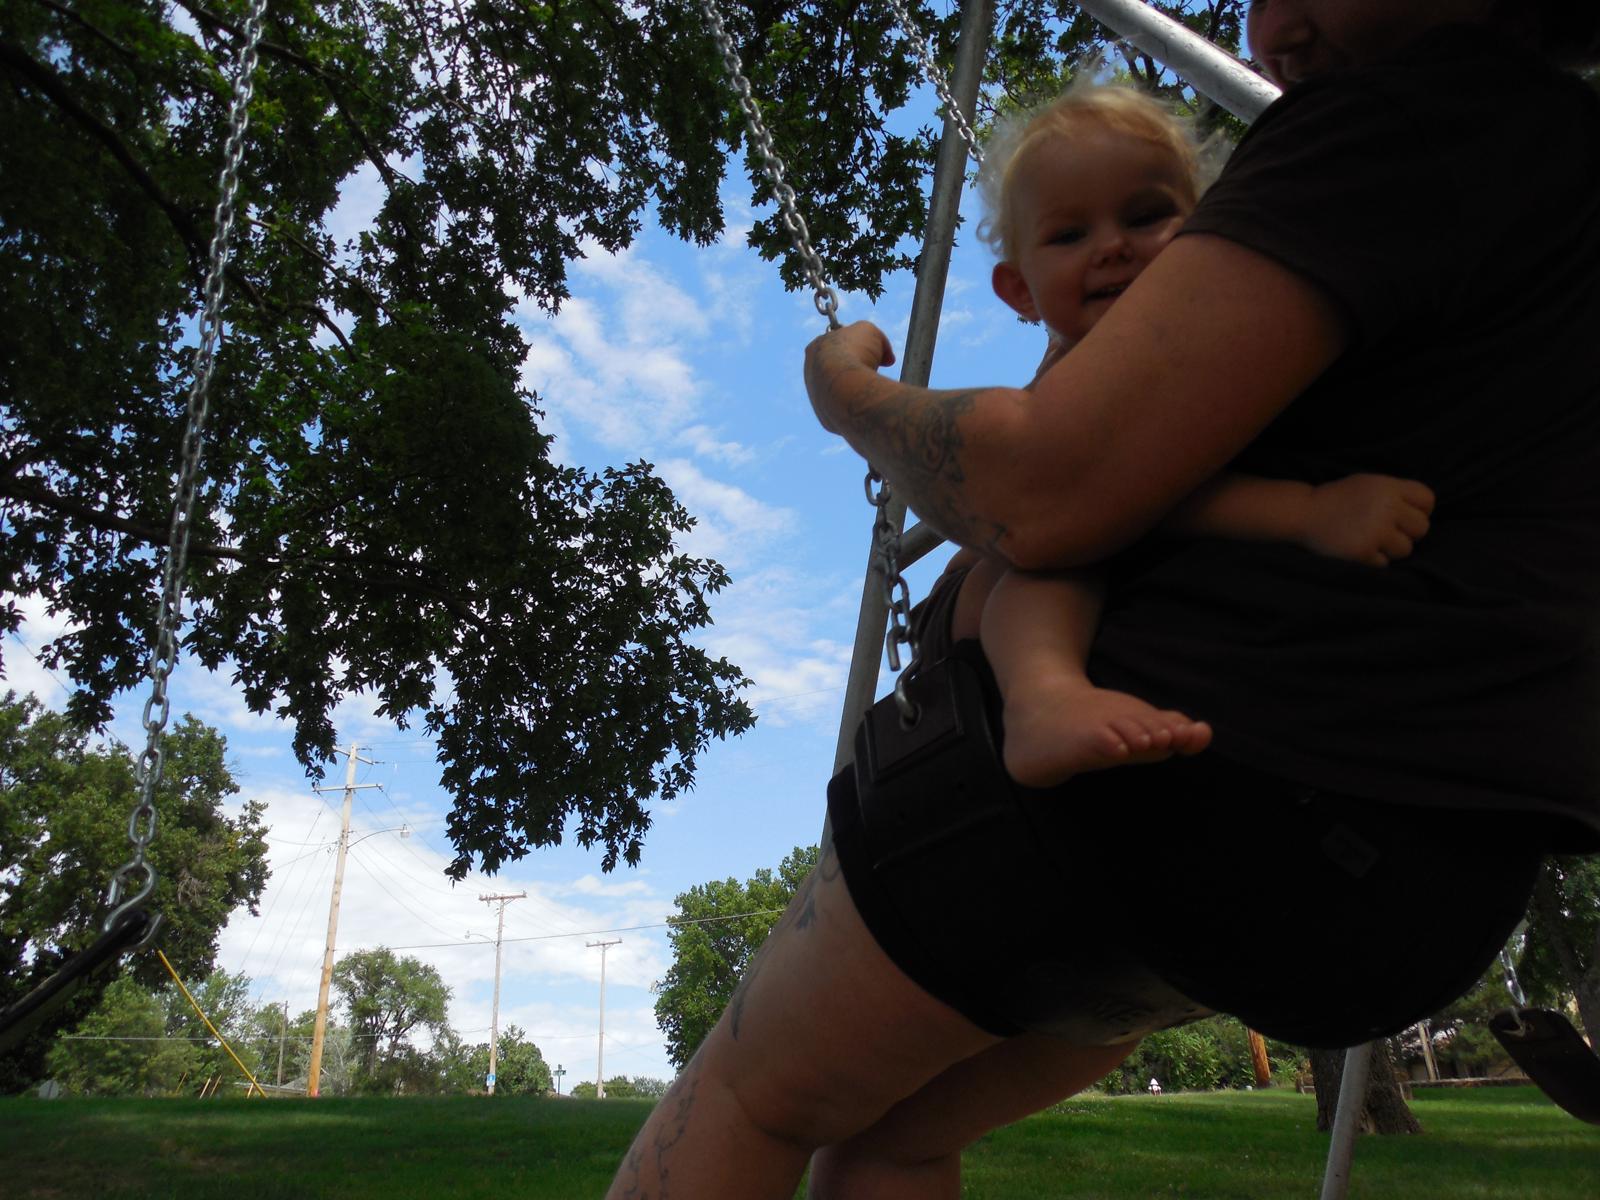 amelia gewel swingset kansas july 2014 (2)